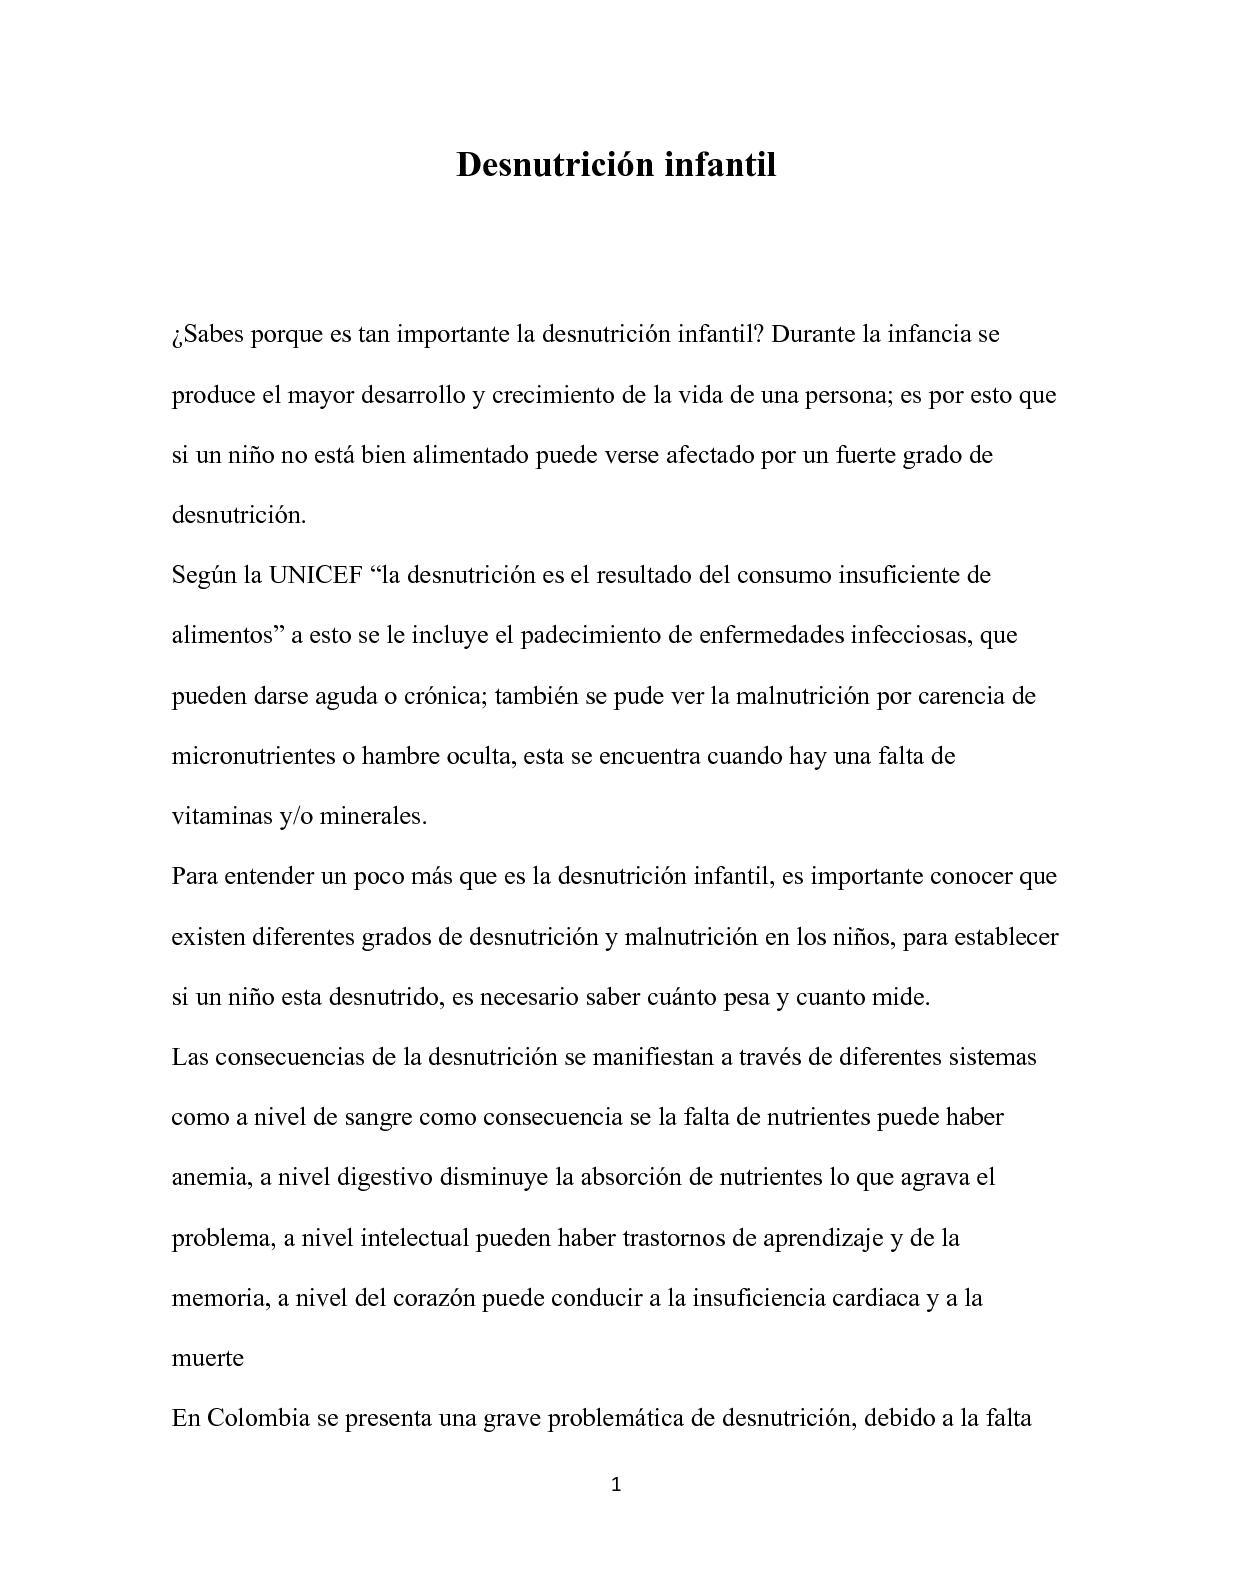 Astaxanthin chemical essay